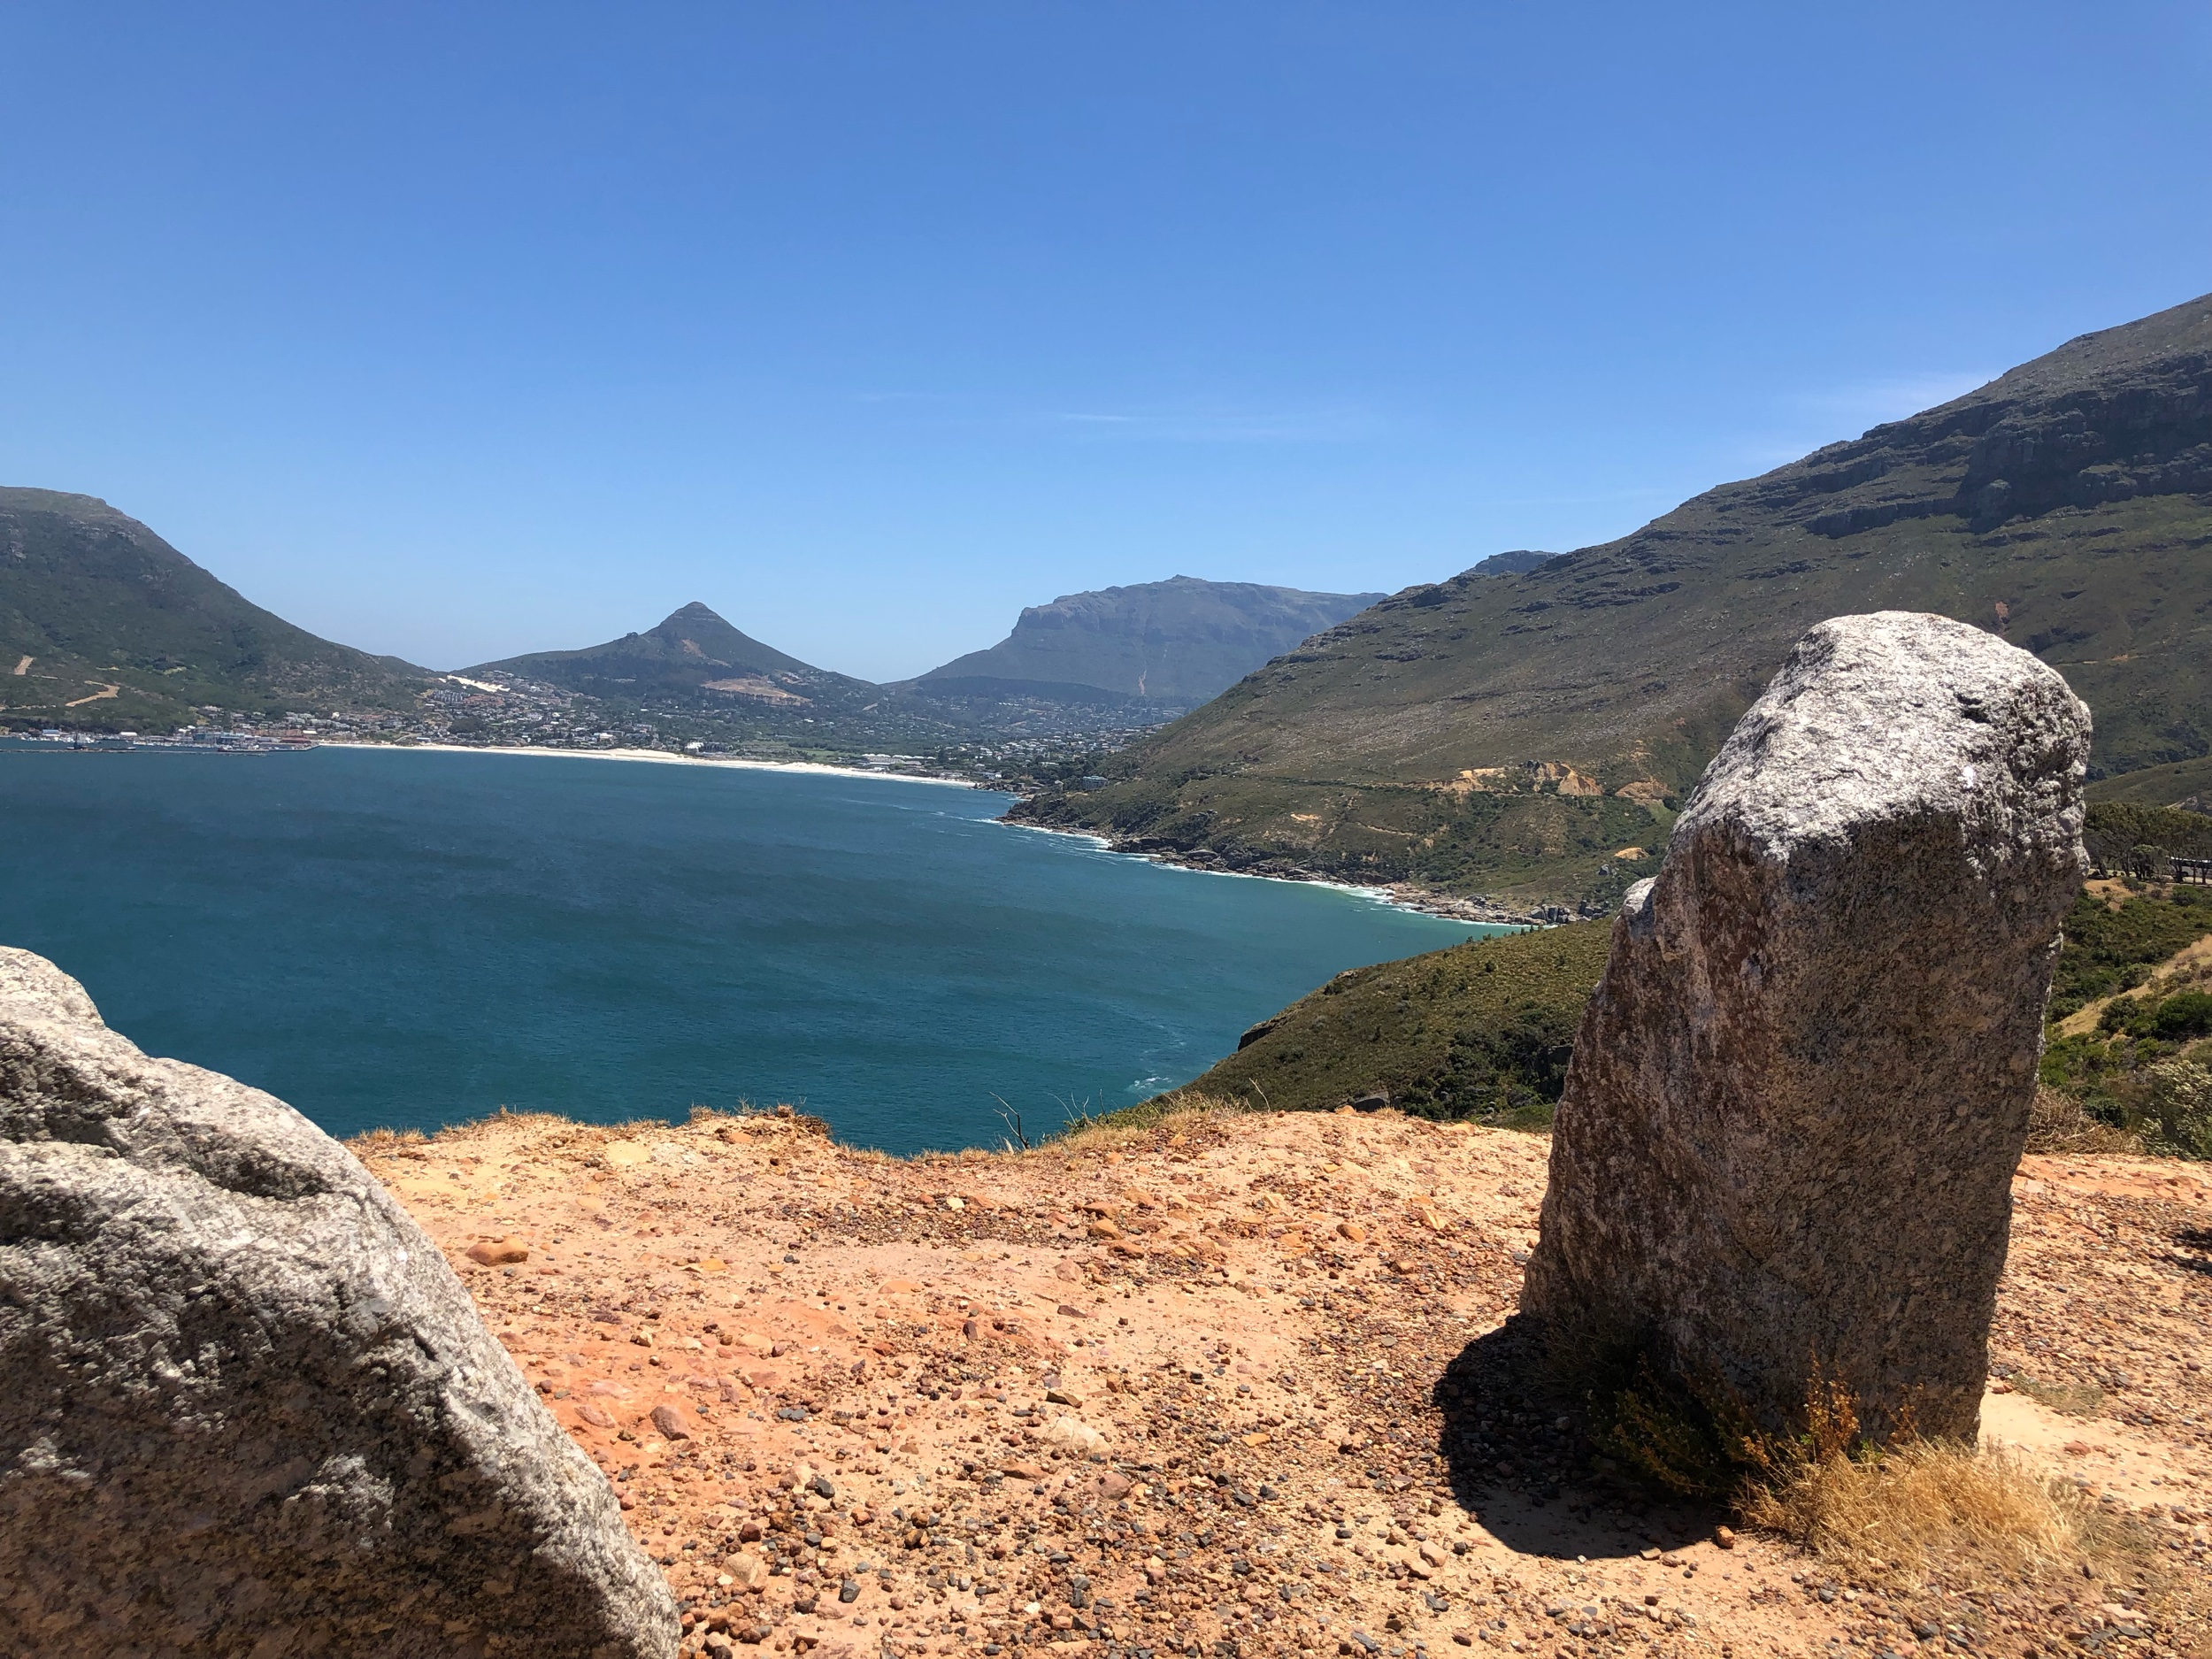 Chapman's Peak view of Hout Bay